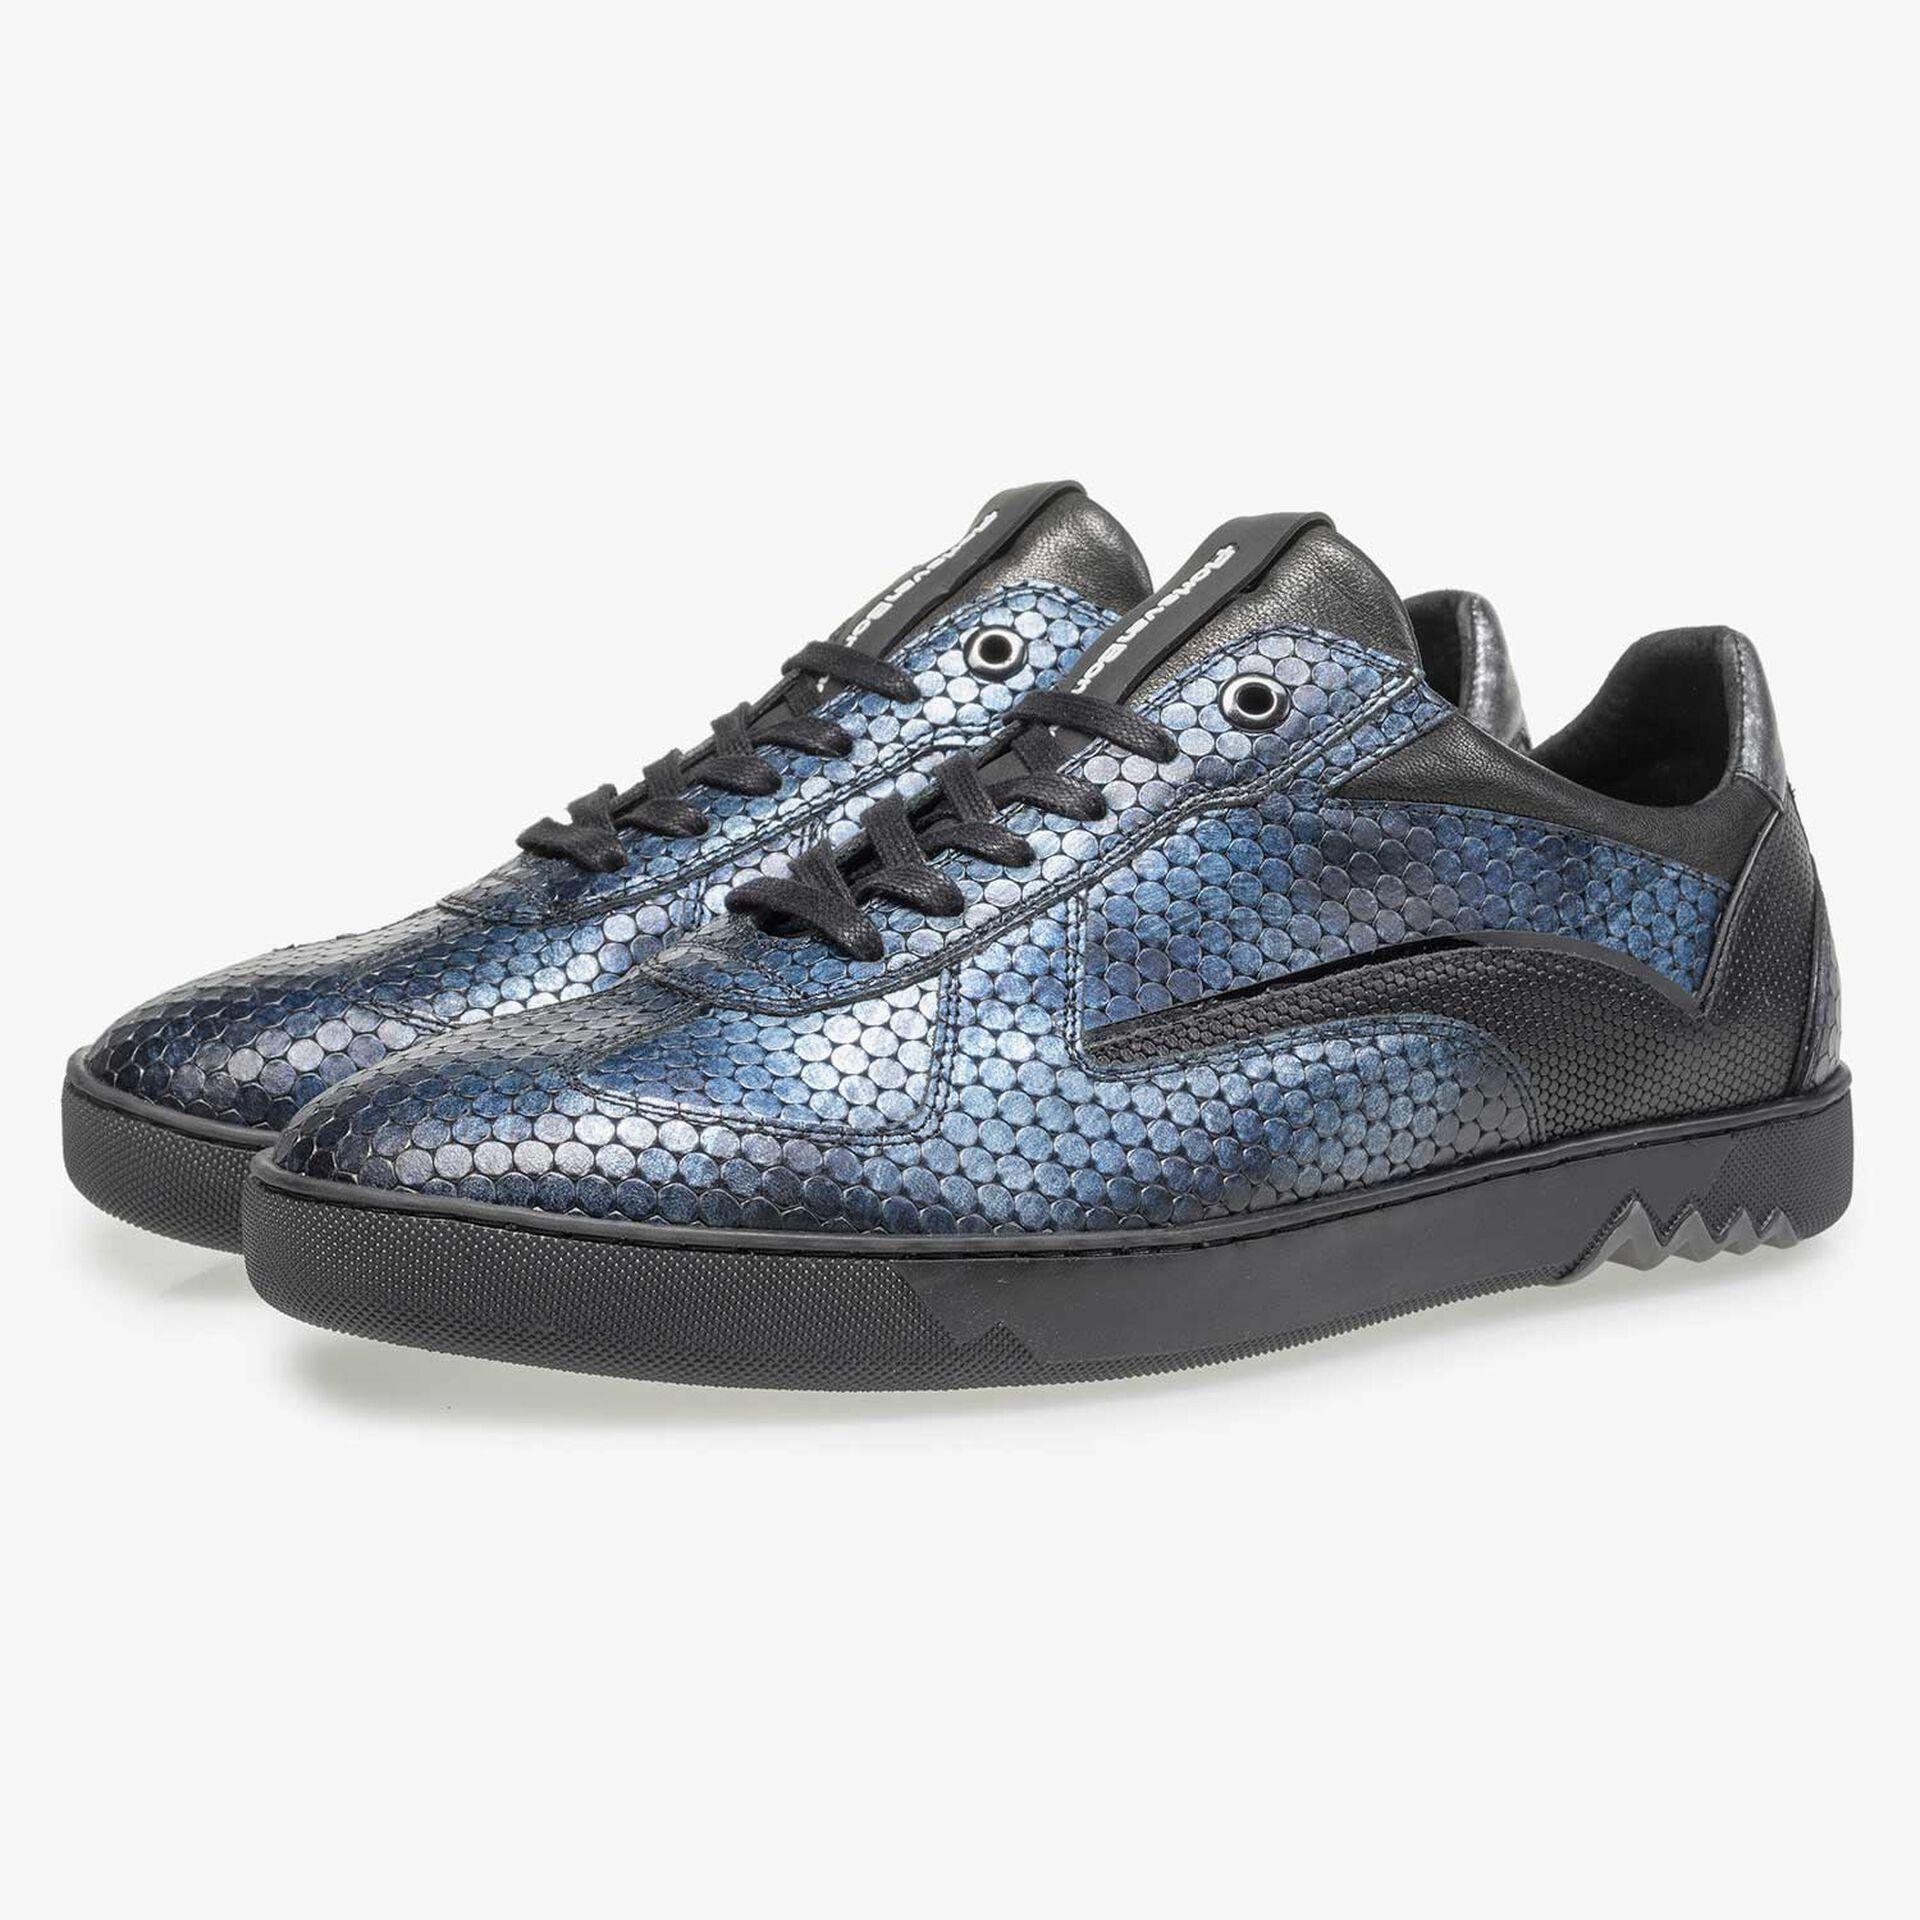 Blue metallic print leather sneaker